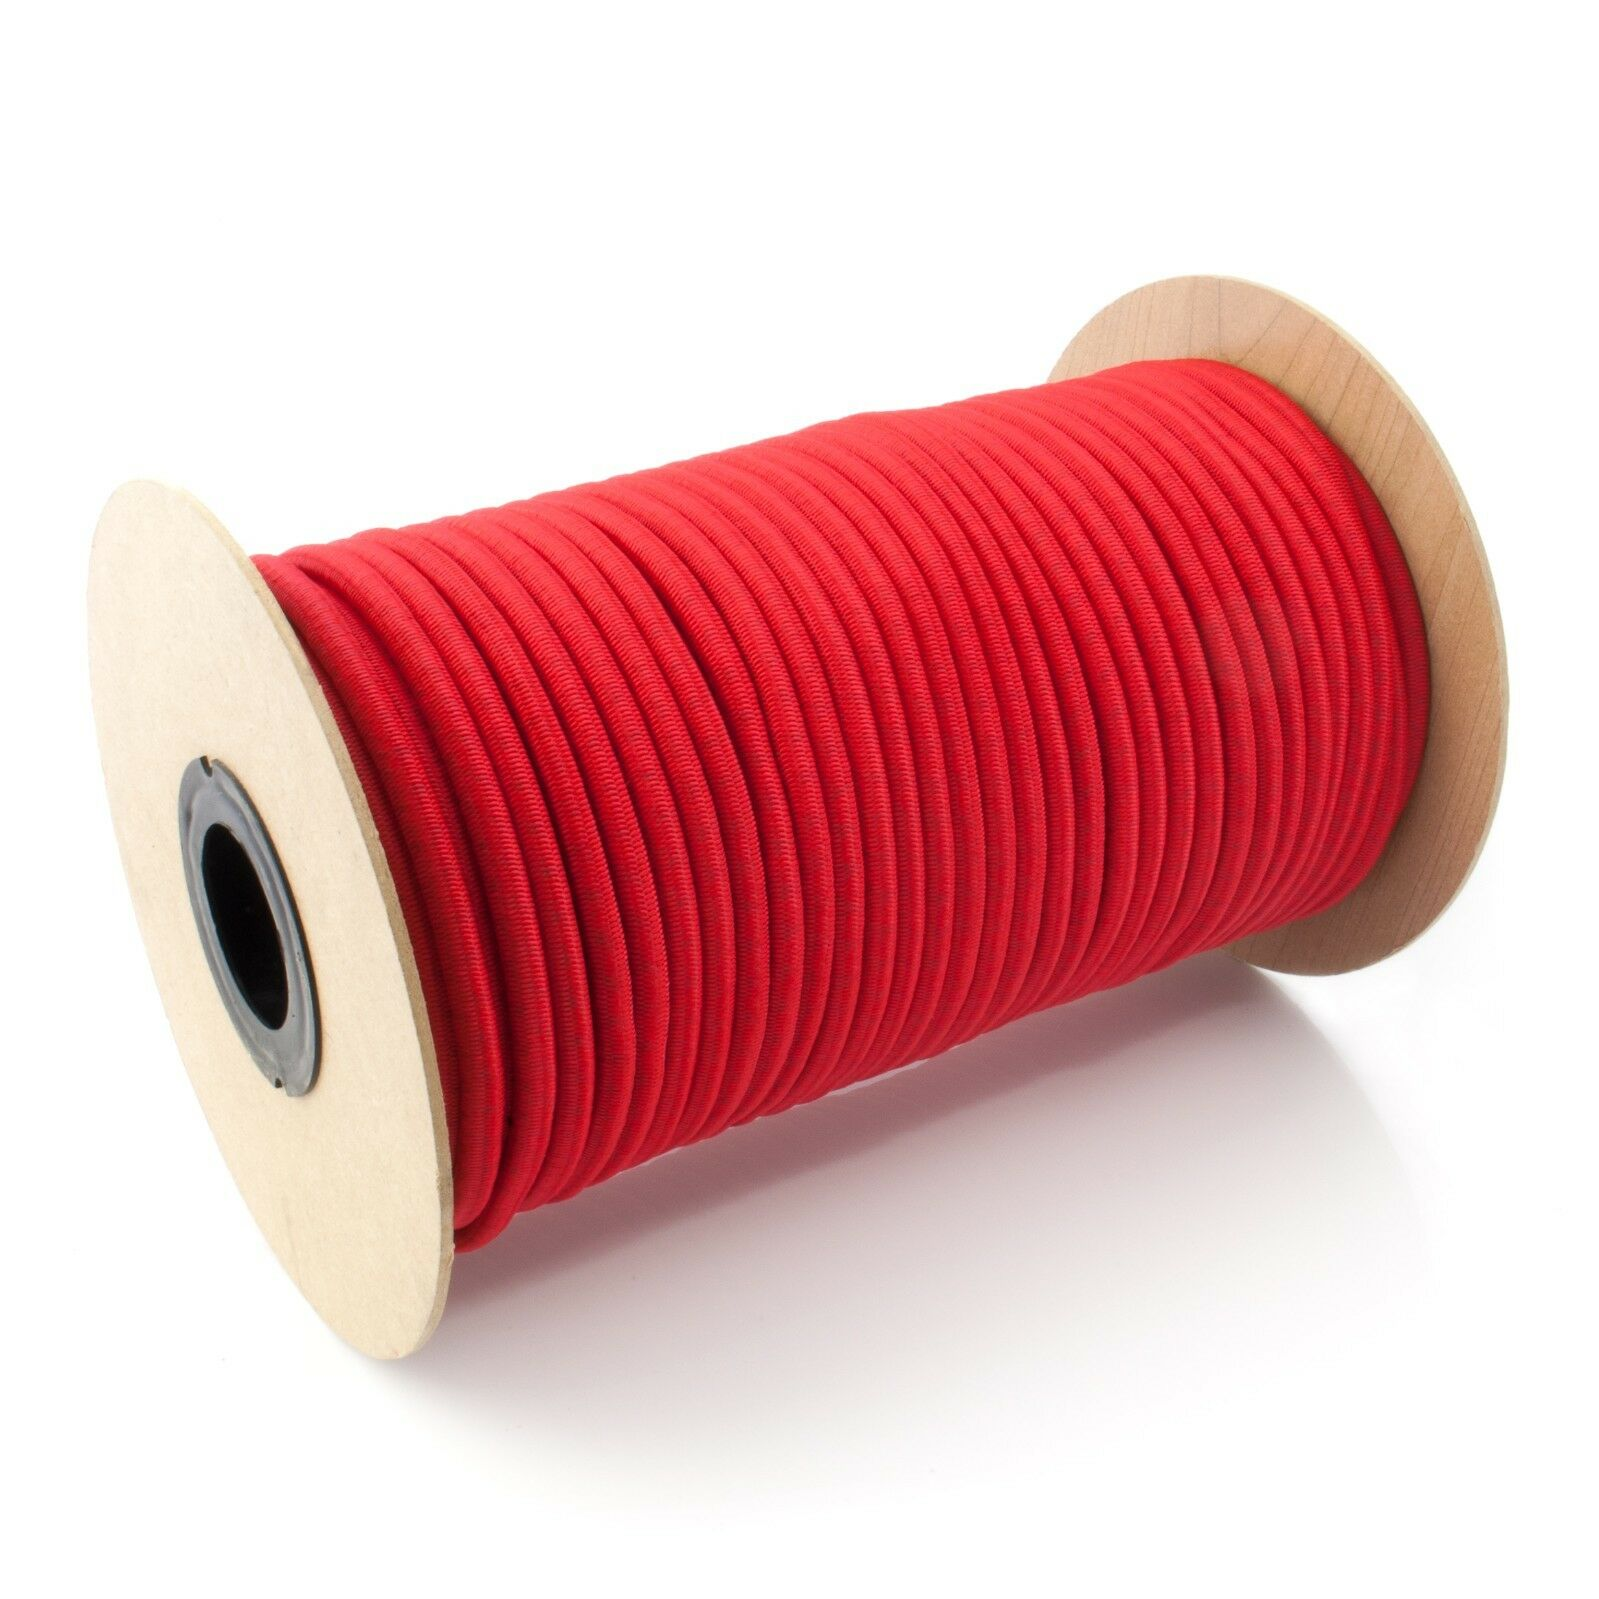 10mm GUMMISEIL GUMMISEIL GUMMISEIL Expanderseil Gummileine Spannseil Planenseil Gummikordel 038239